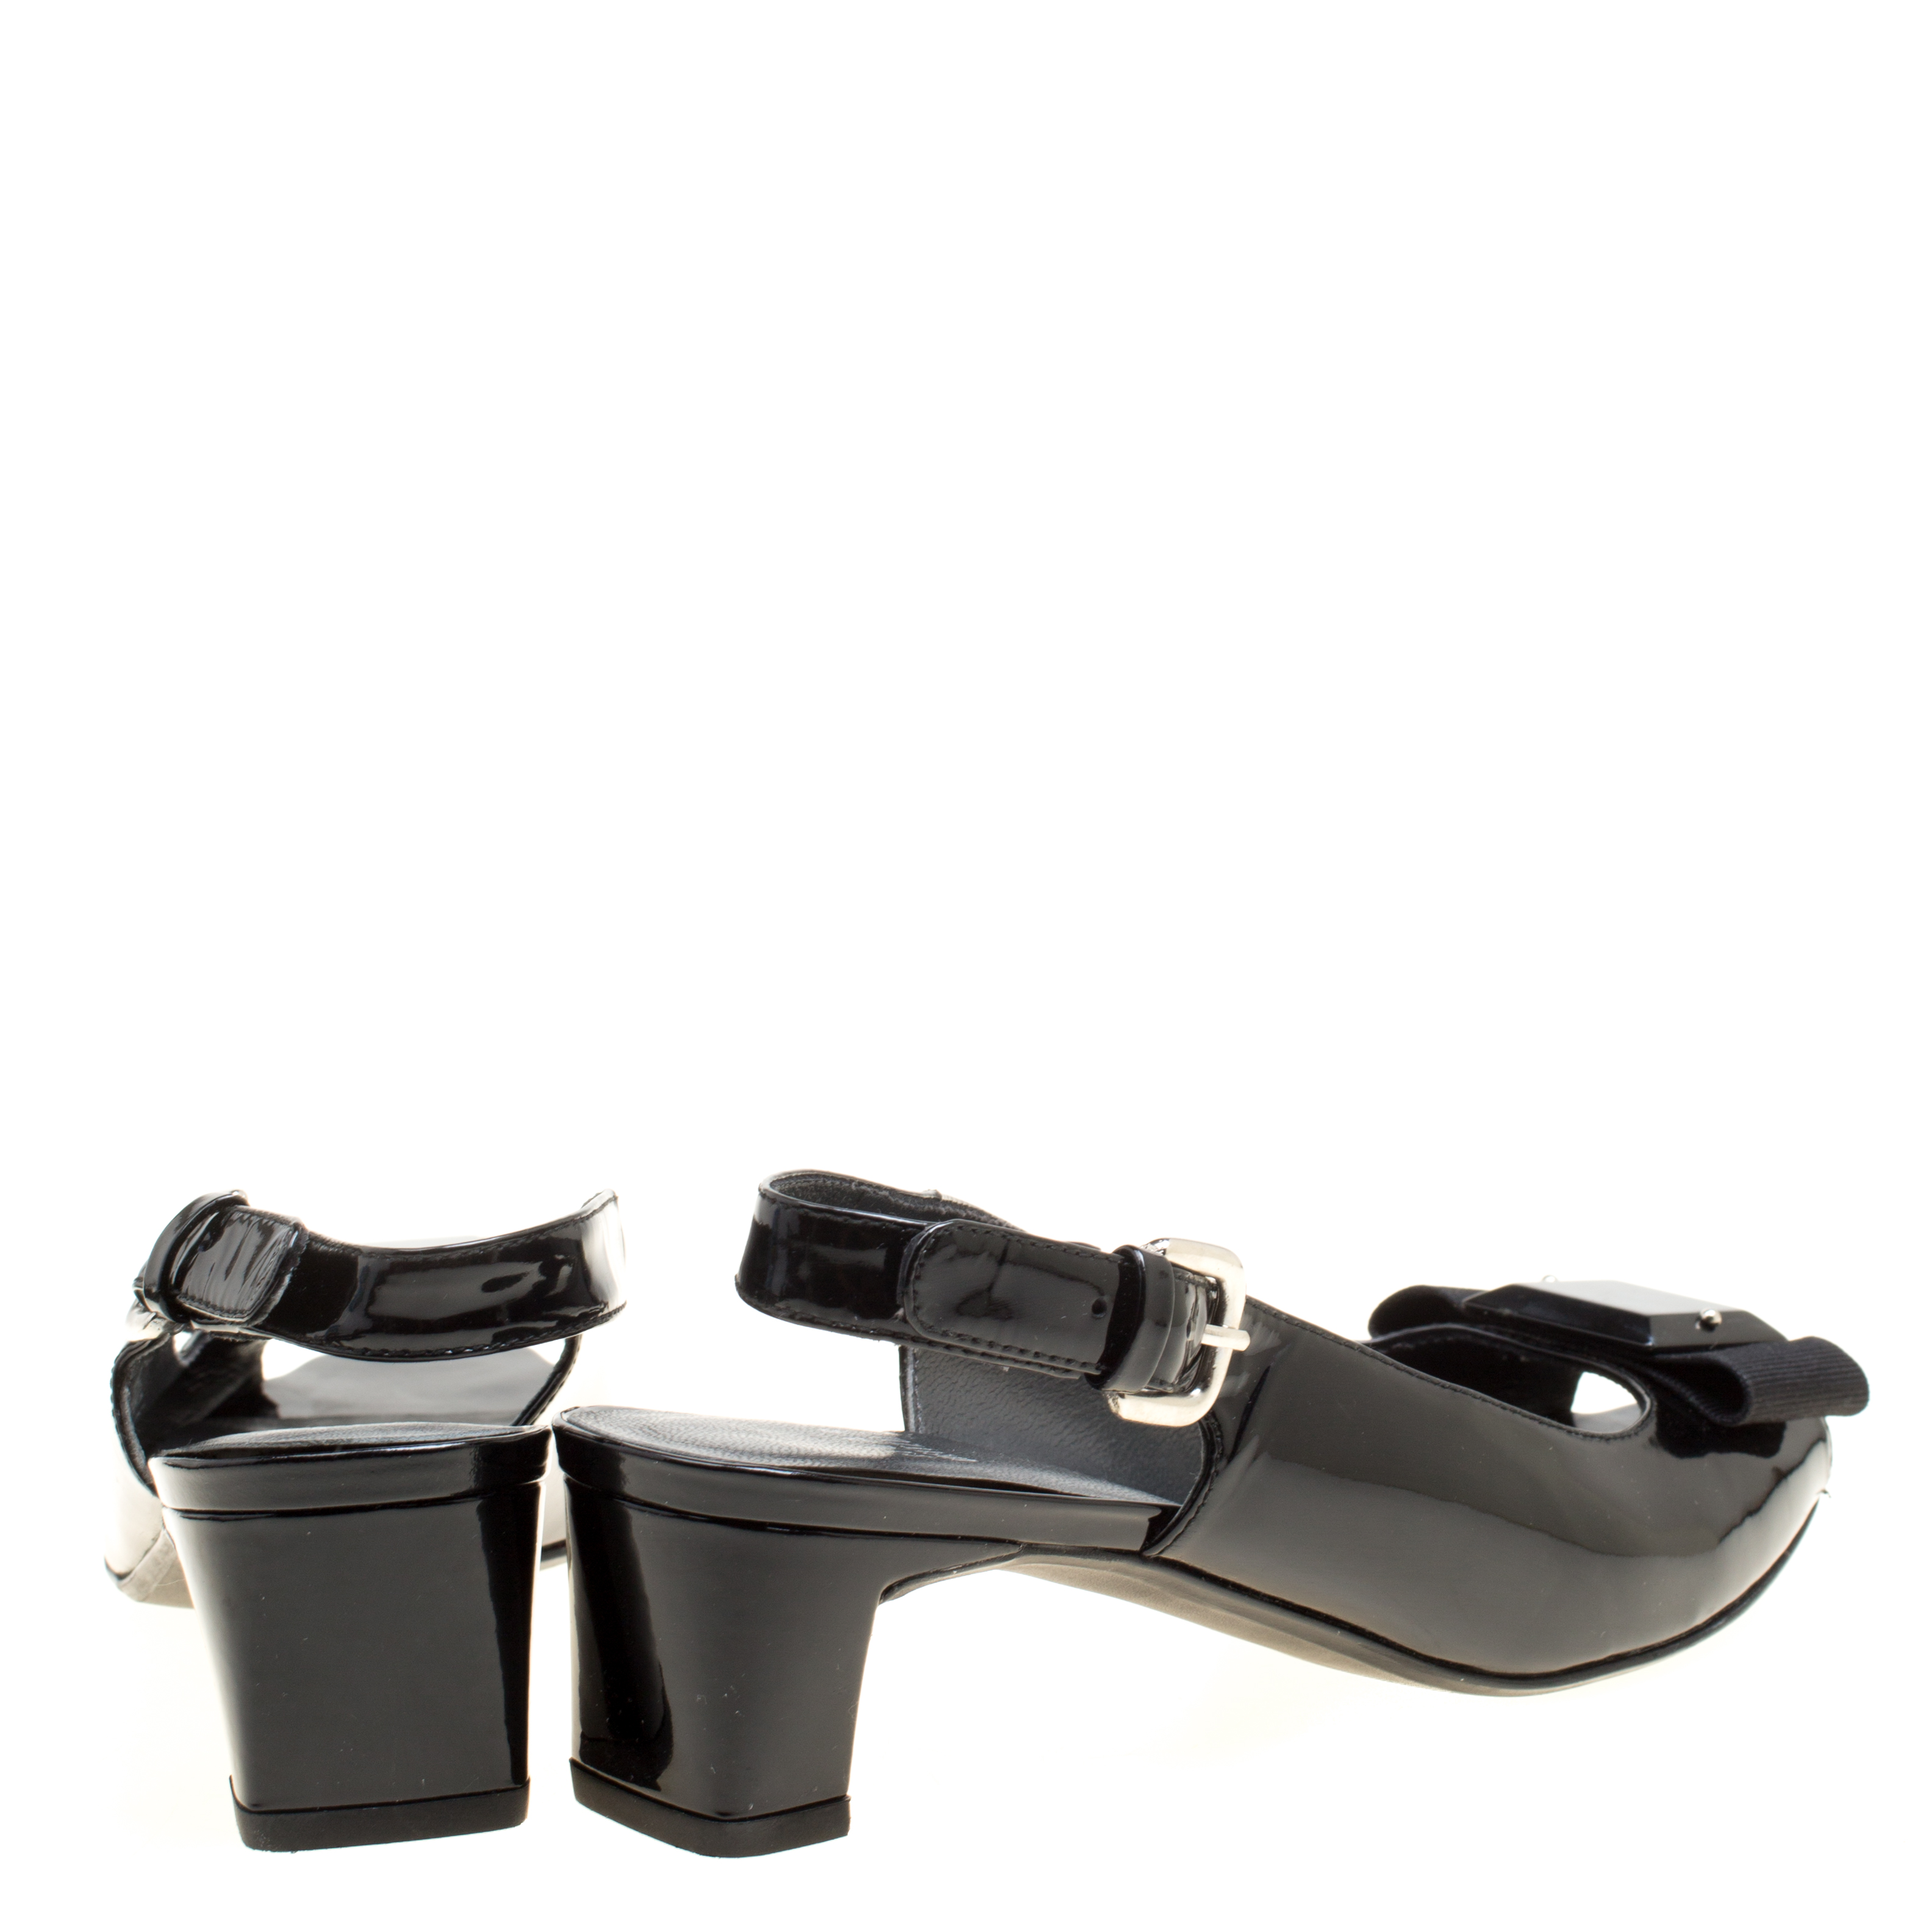 Stuart Weitzman Mary High Heel Square Toe Pumps Size 7 MSRP